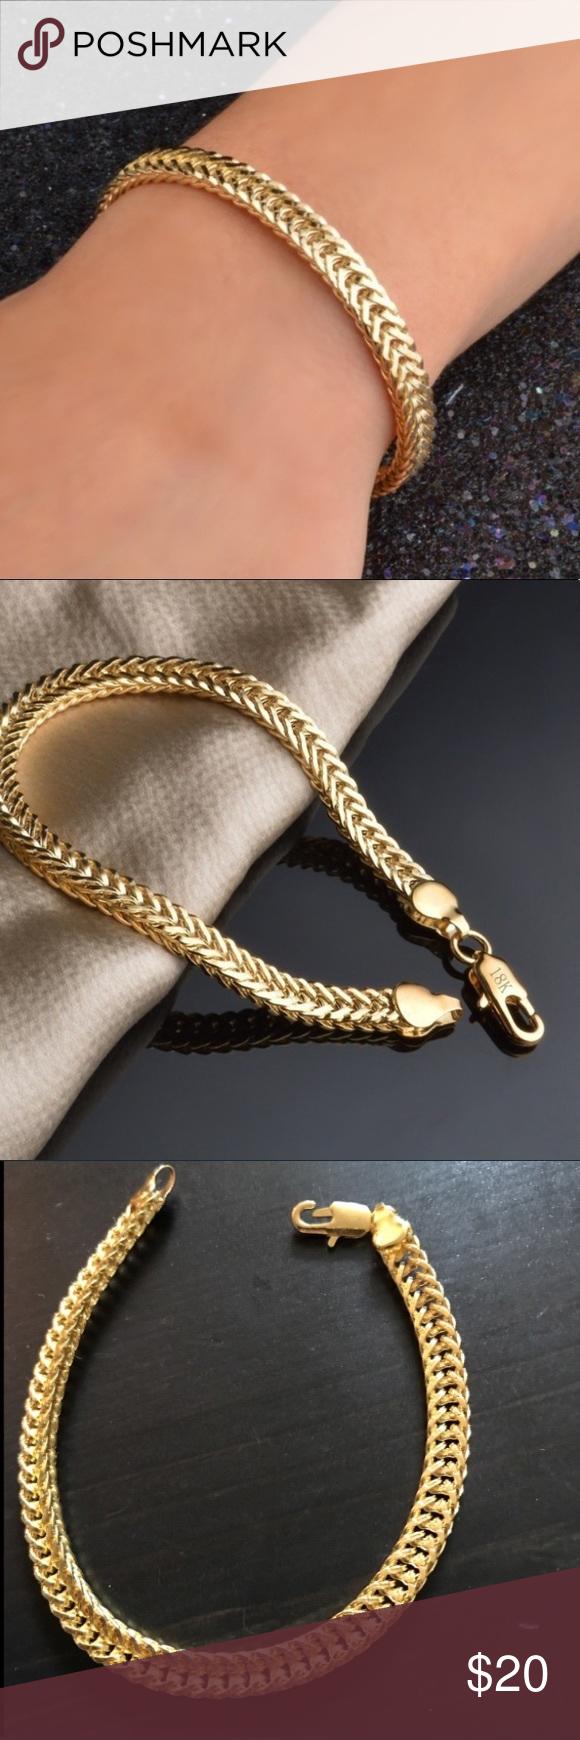 Unisex k gf cool punk bracelet cuban style gold fashion fashion